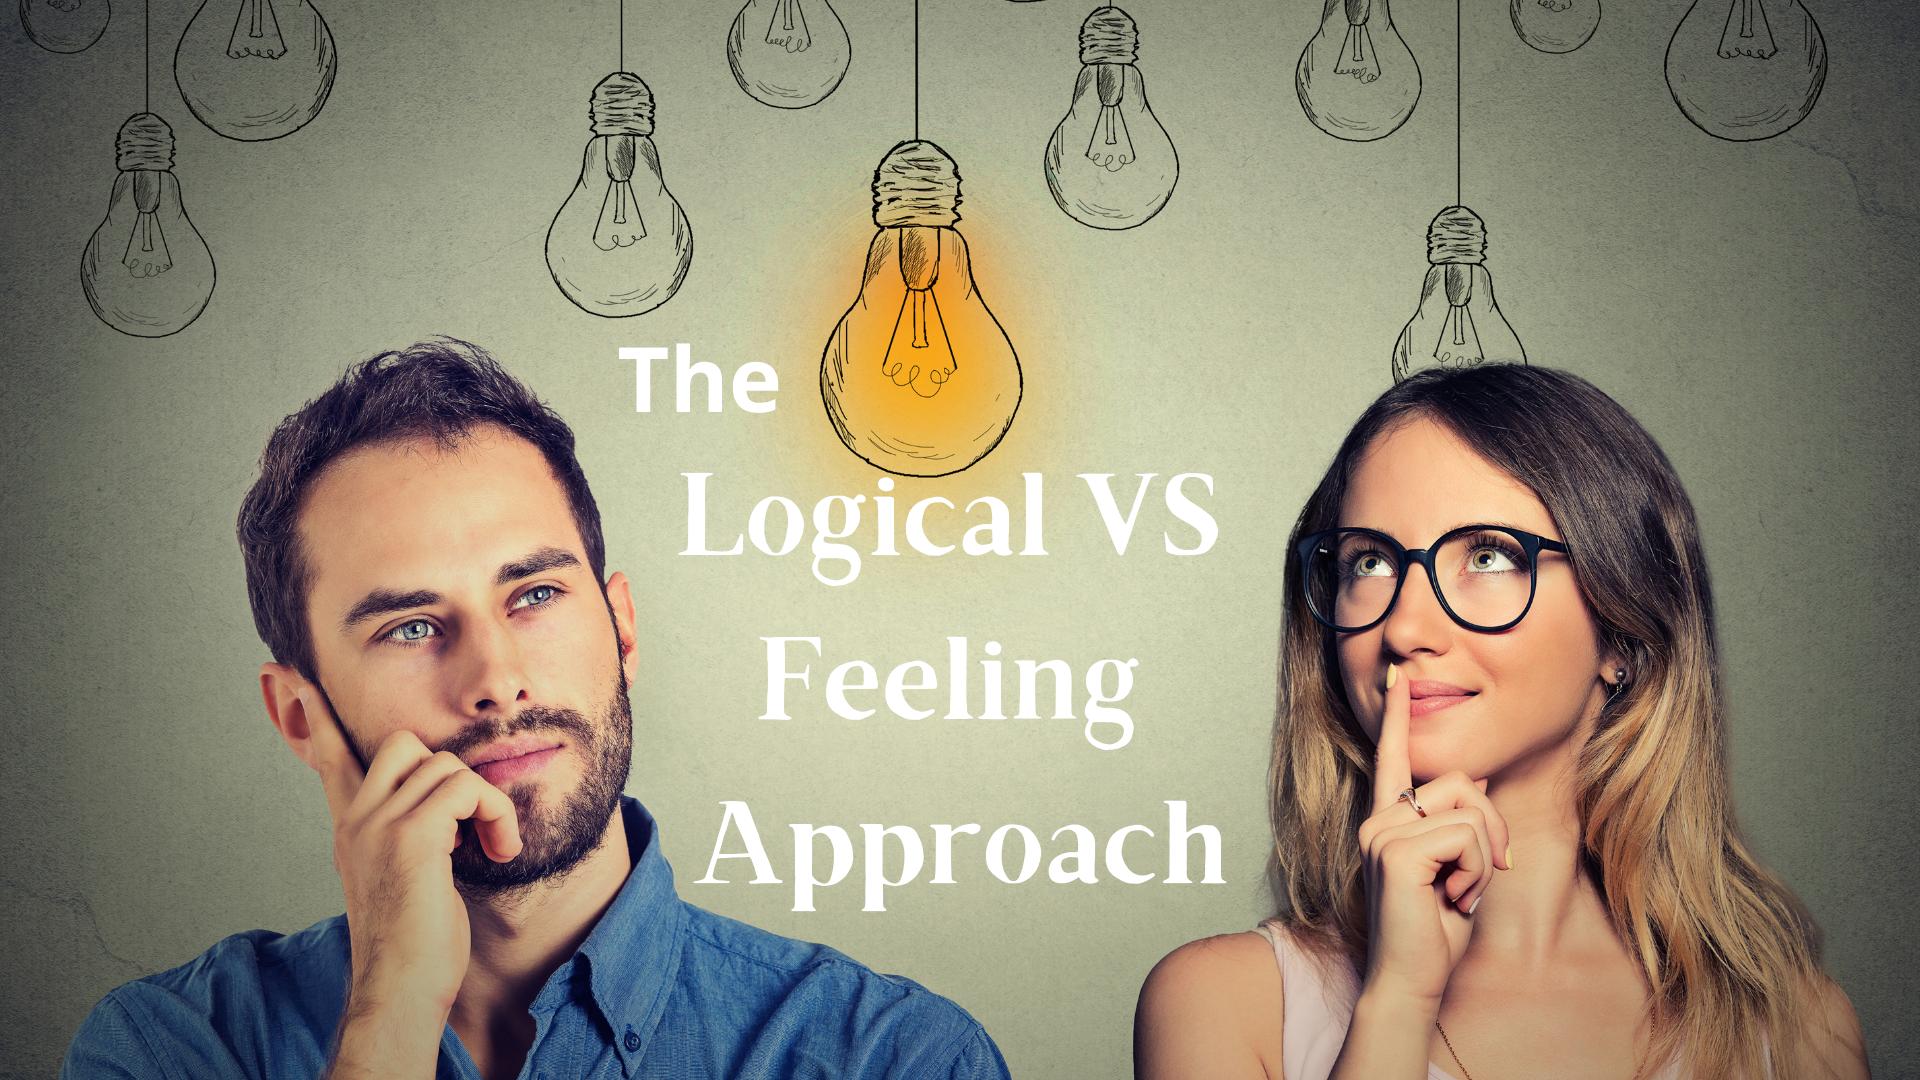 Logical VS Feeling Approach - Adobe Stock